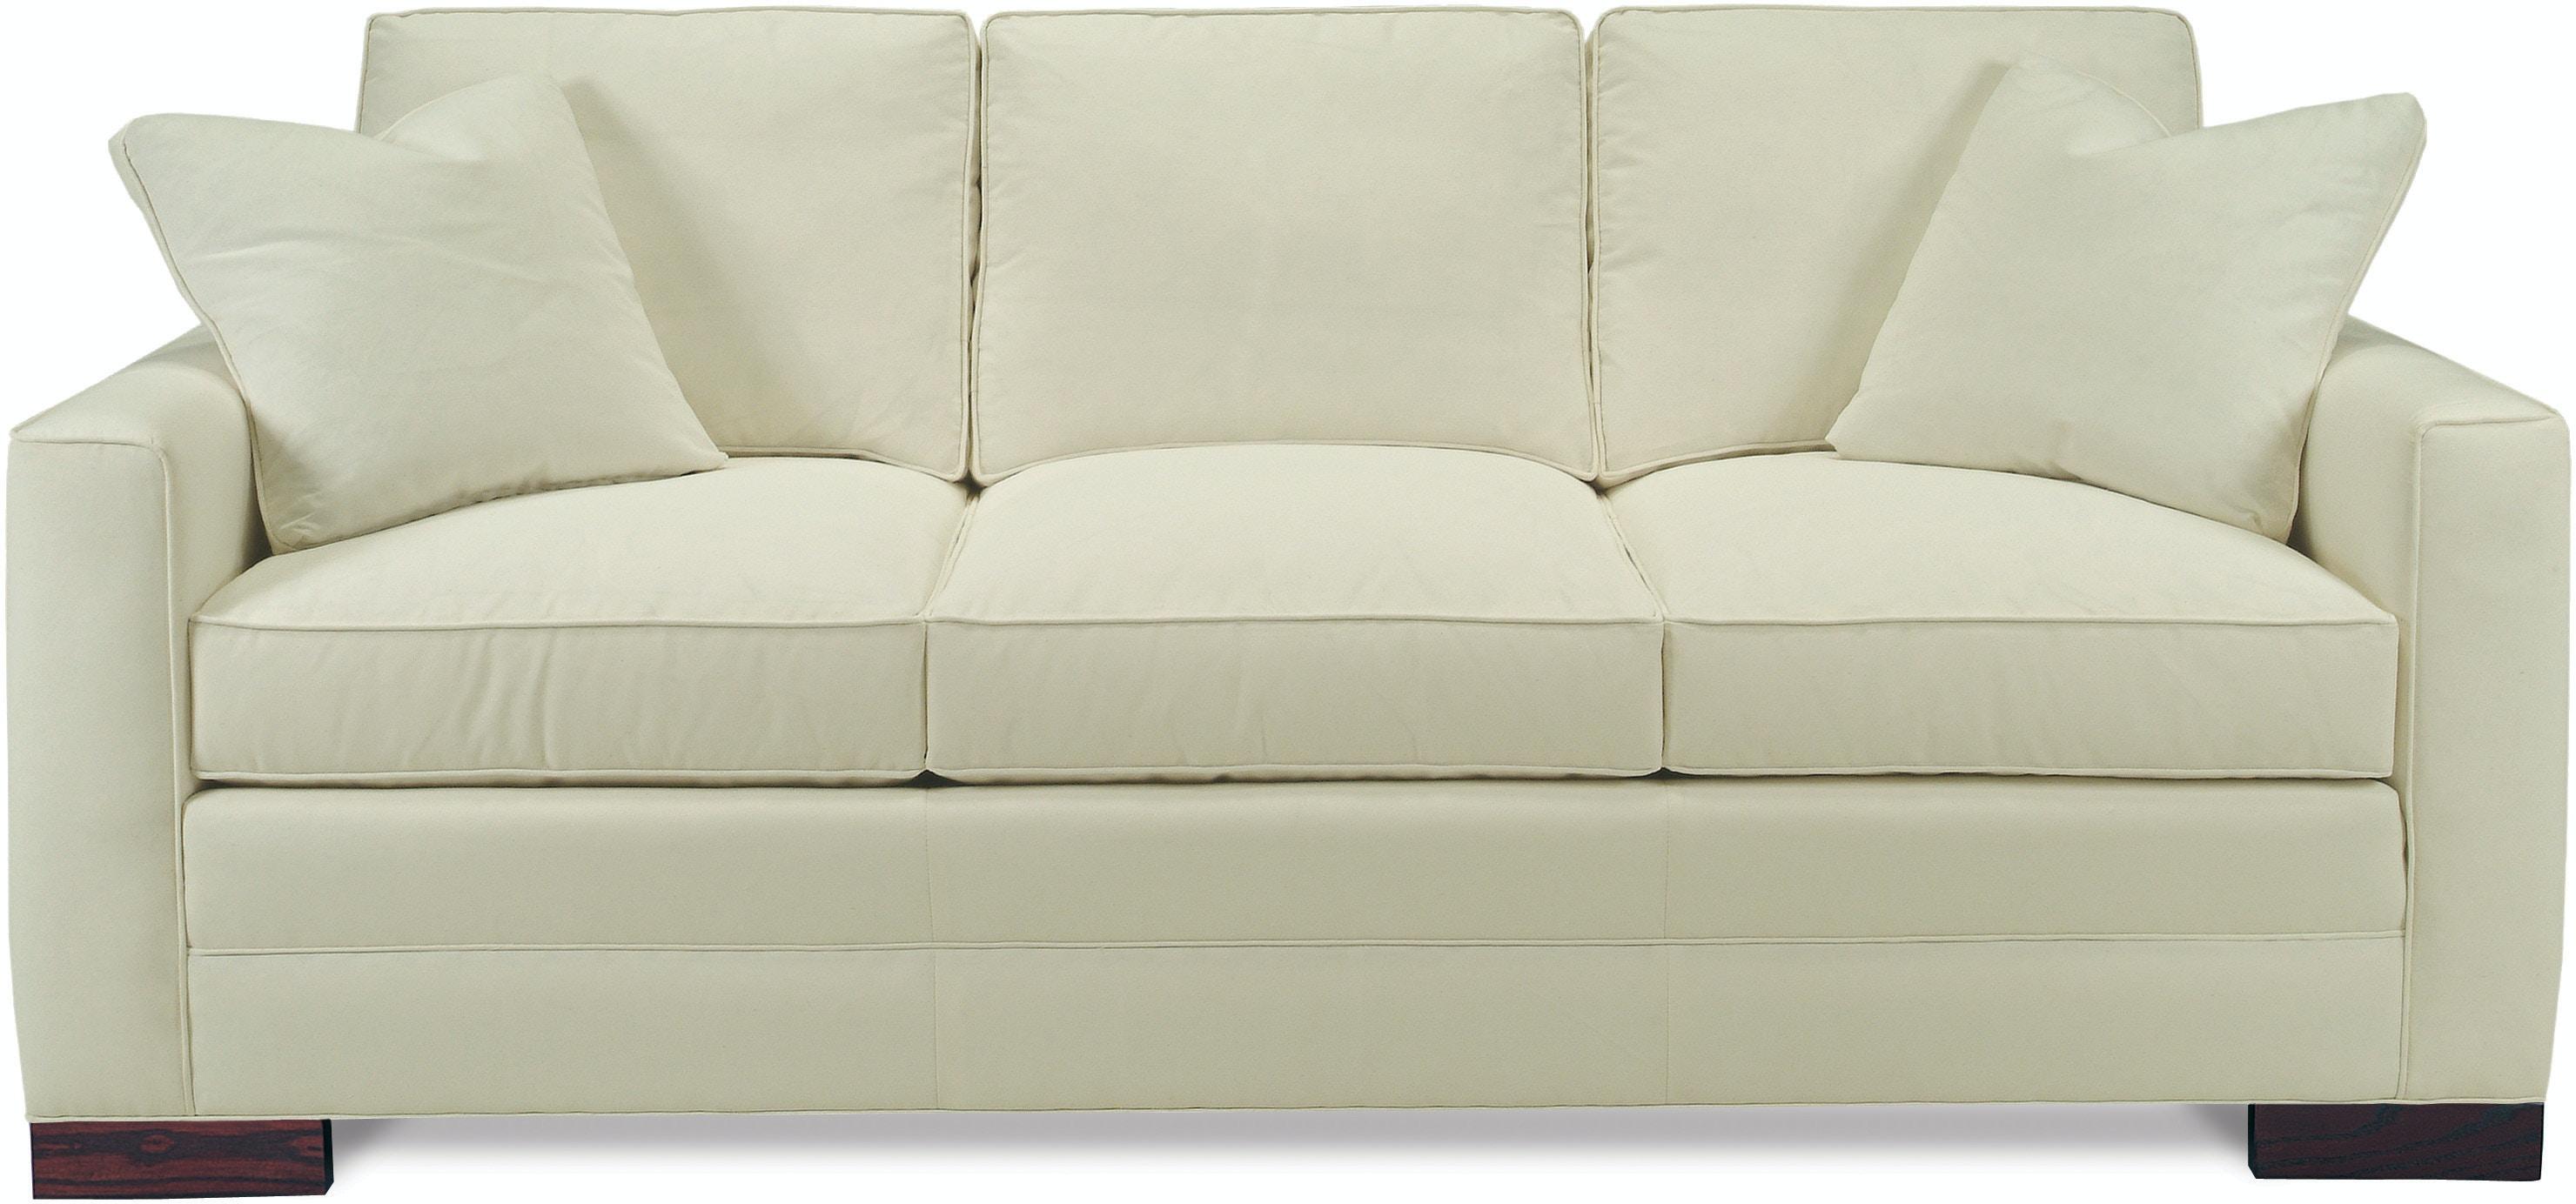 Vanguard Furniture 610 S Living Room Summerton Sofa